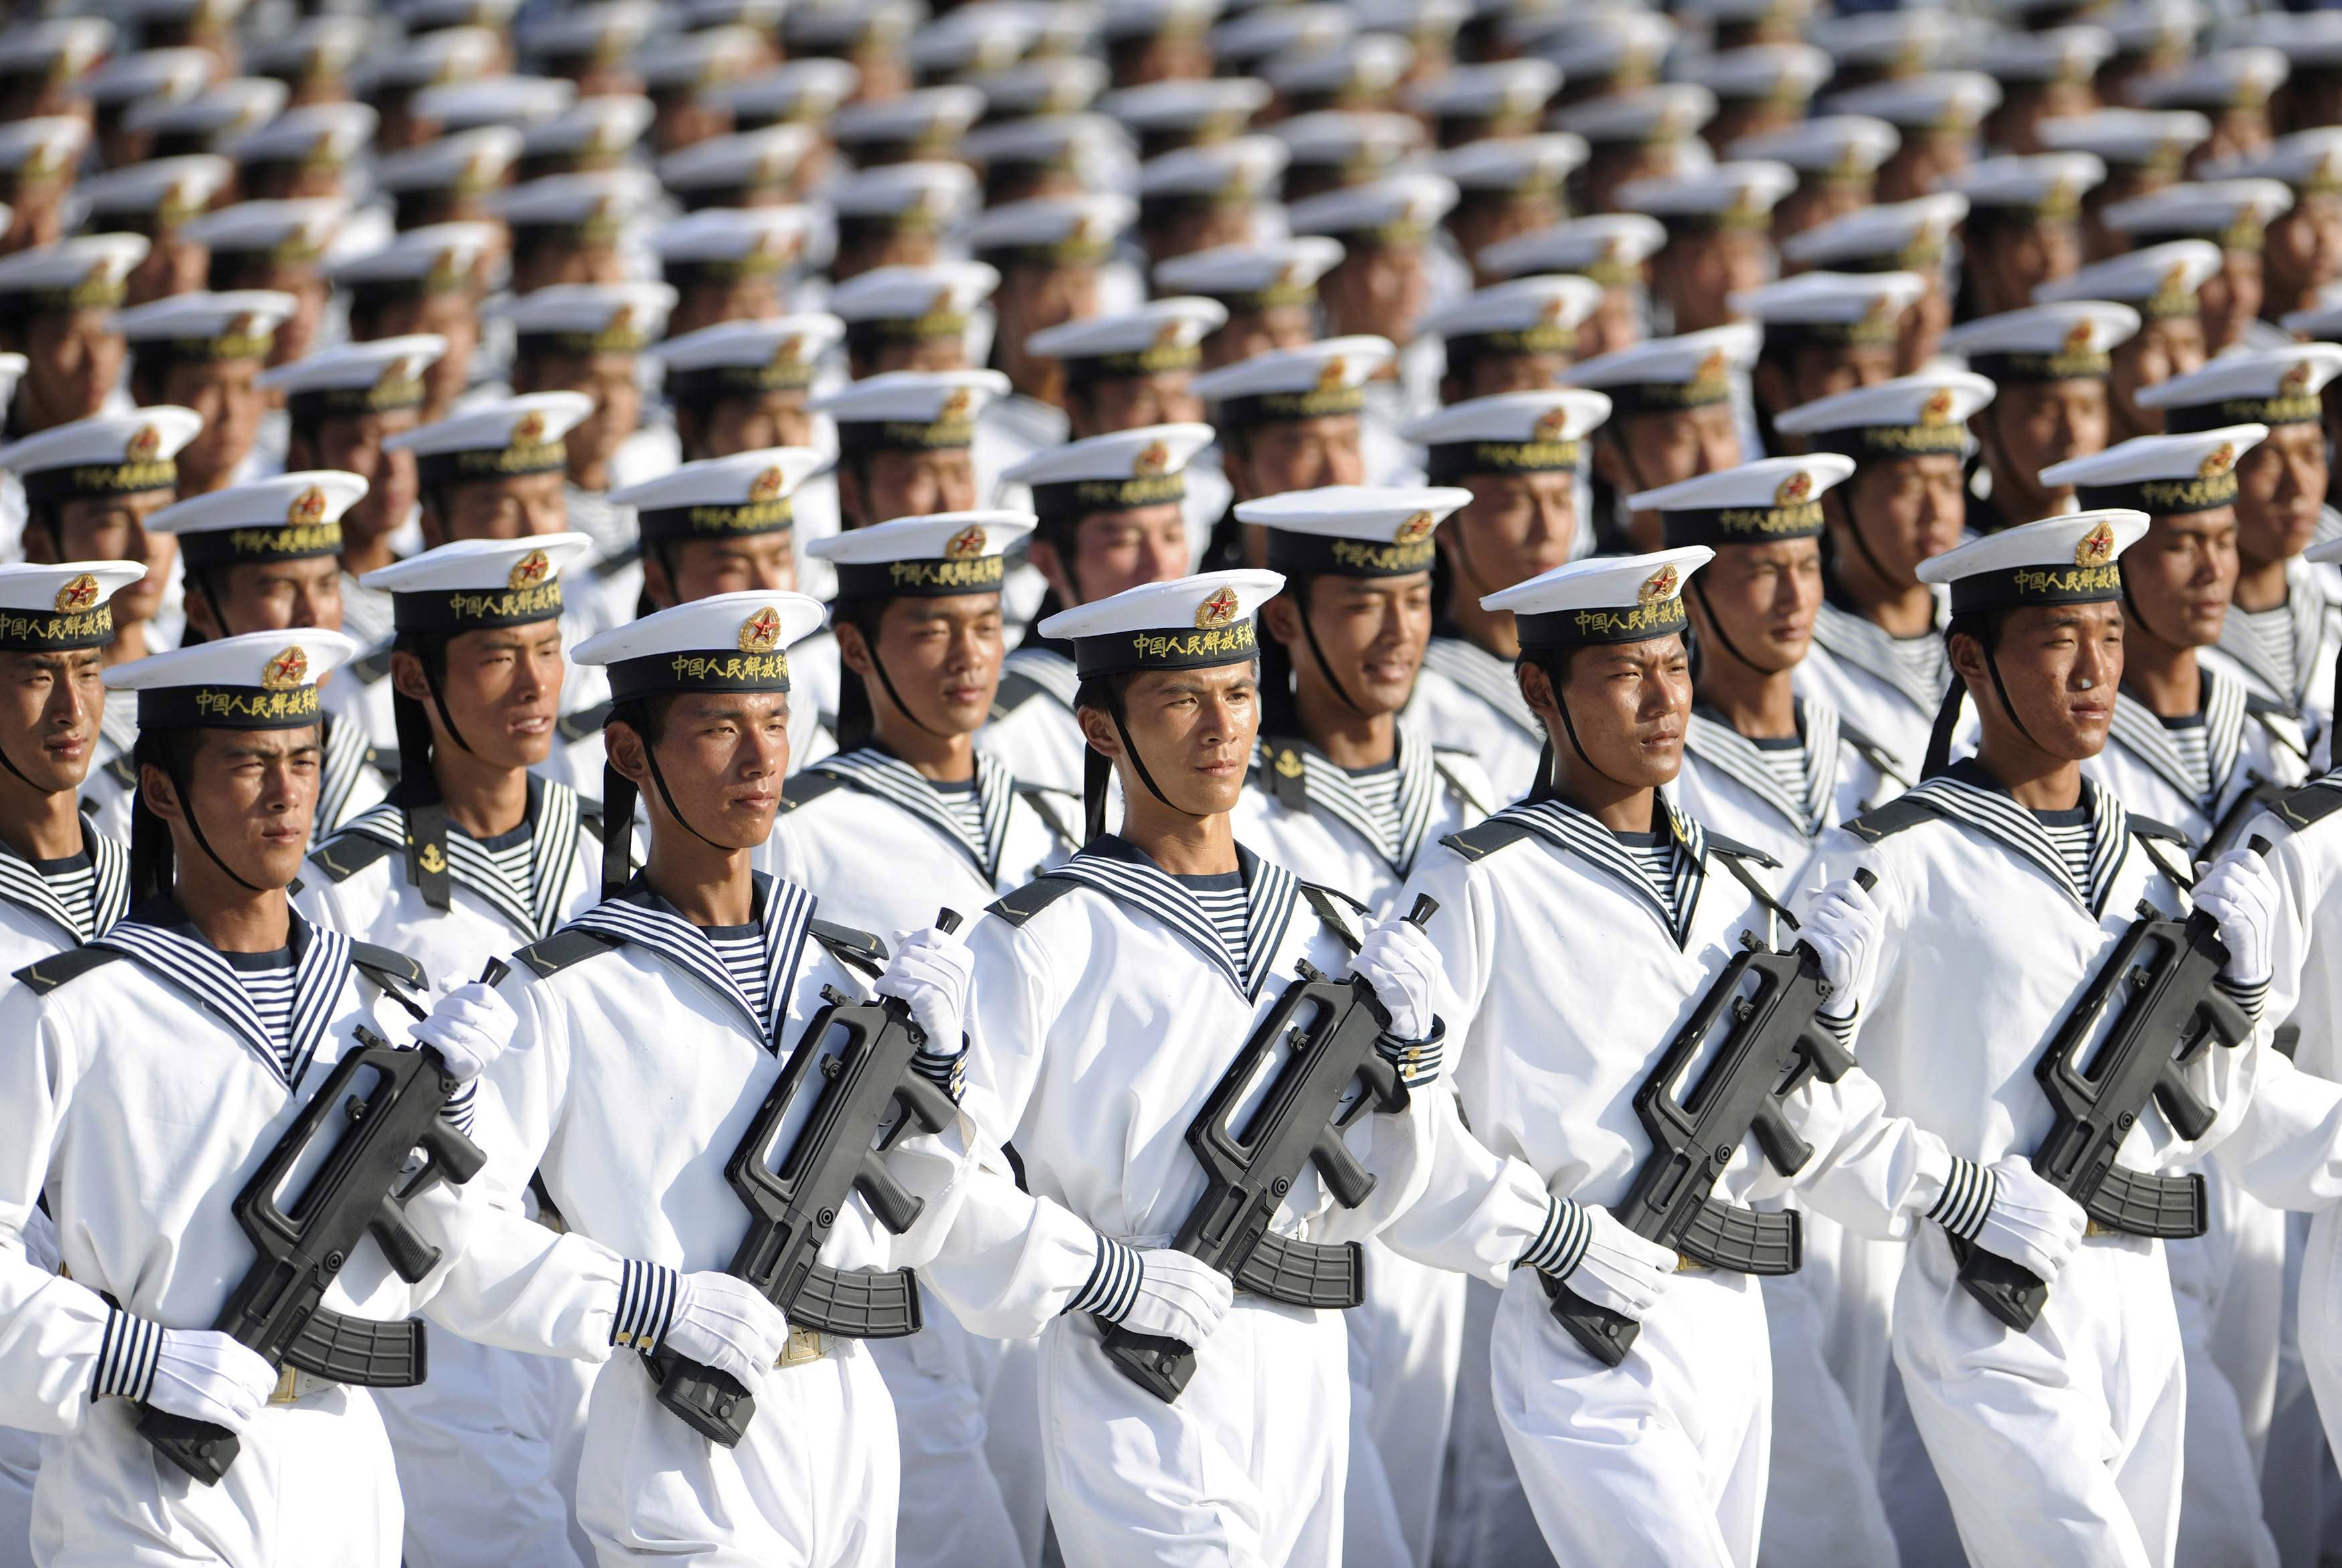 China: Entrepreneurs vs military